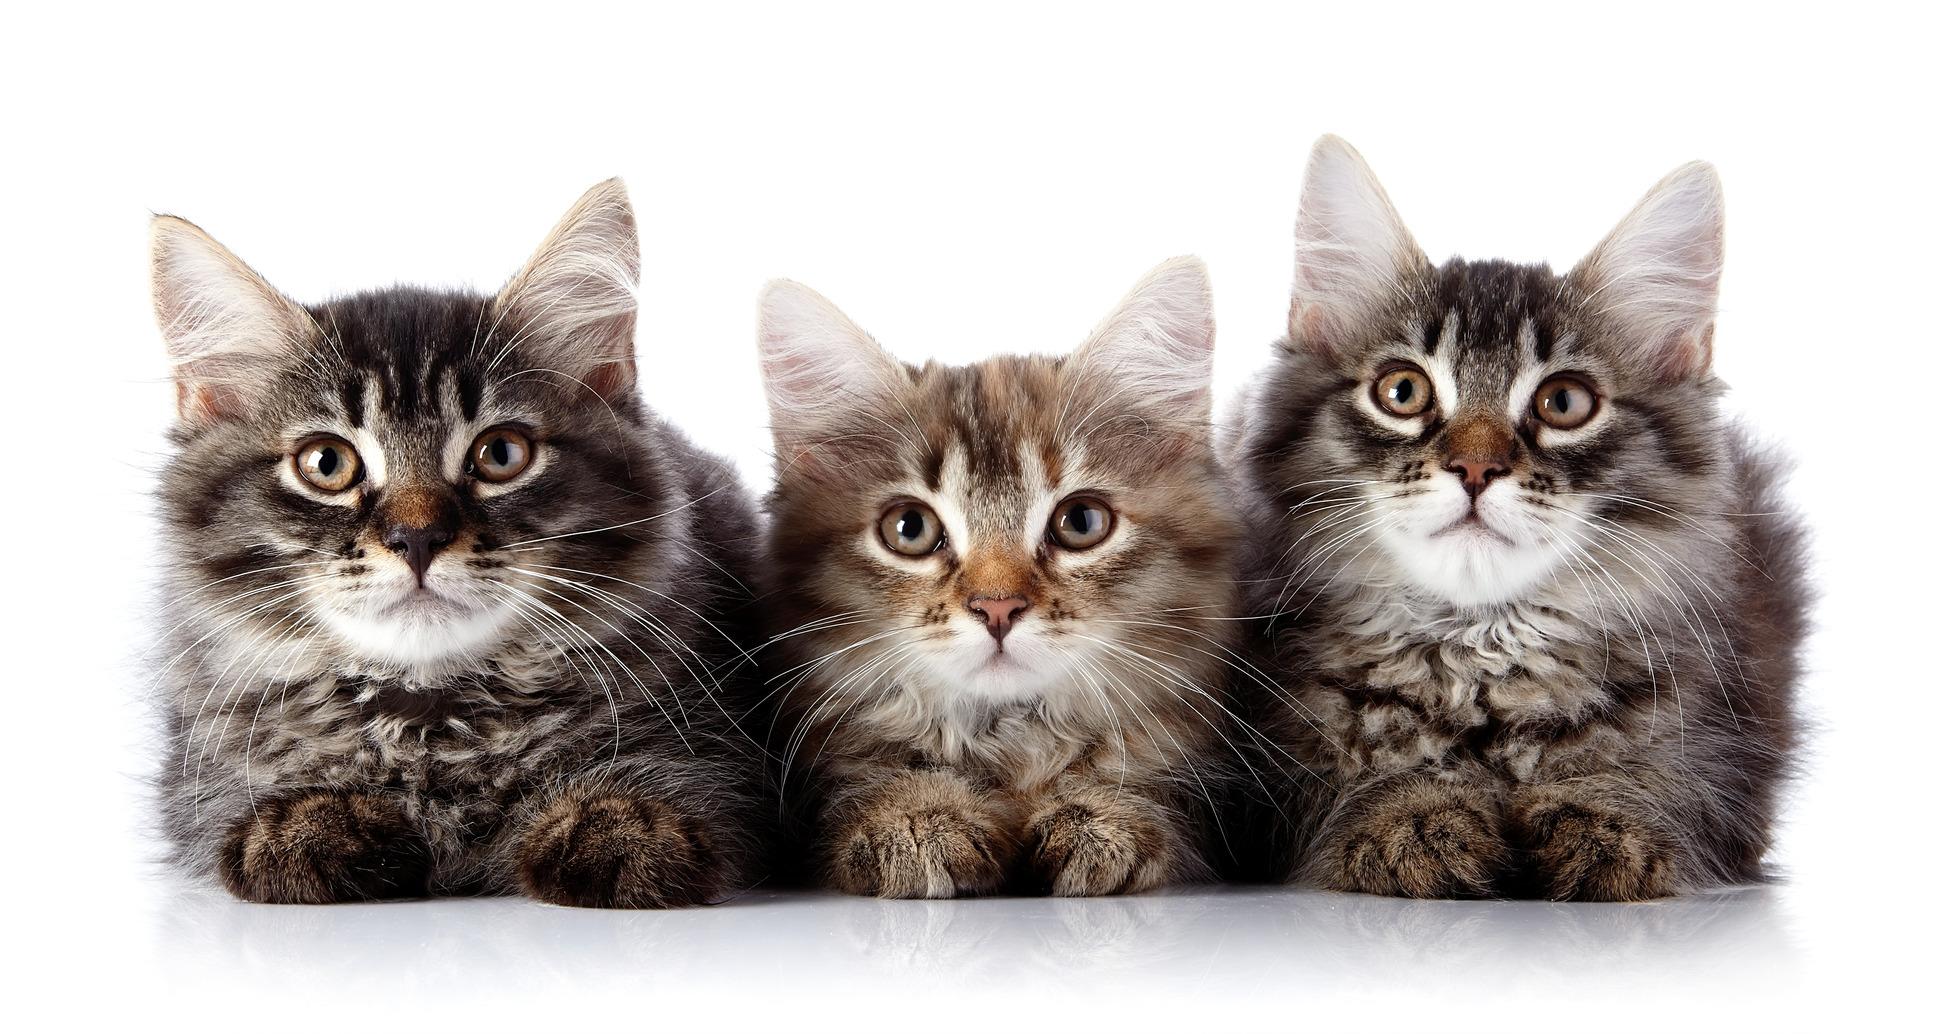 HQ Cat Wallpapers | File 559.8Kb